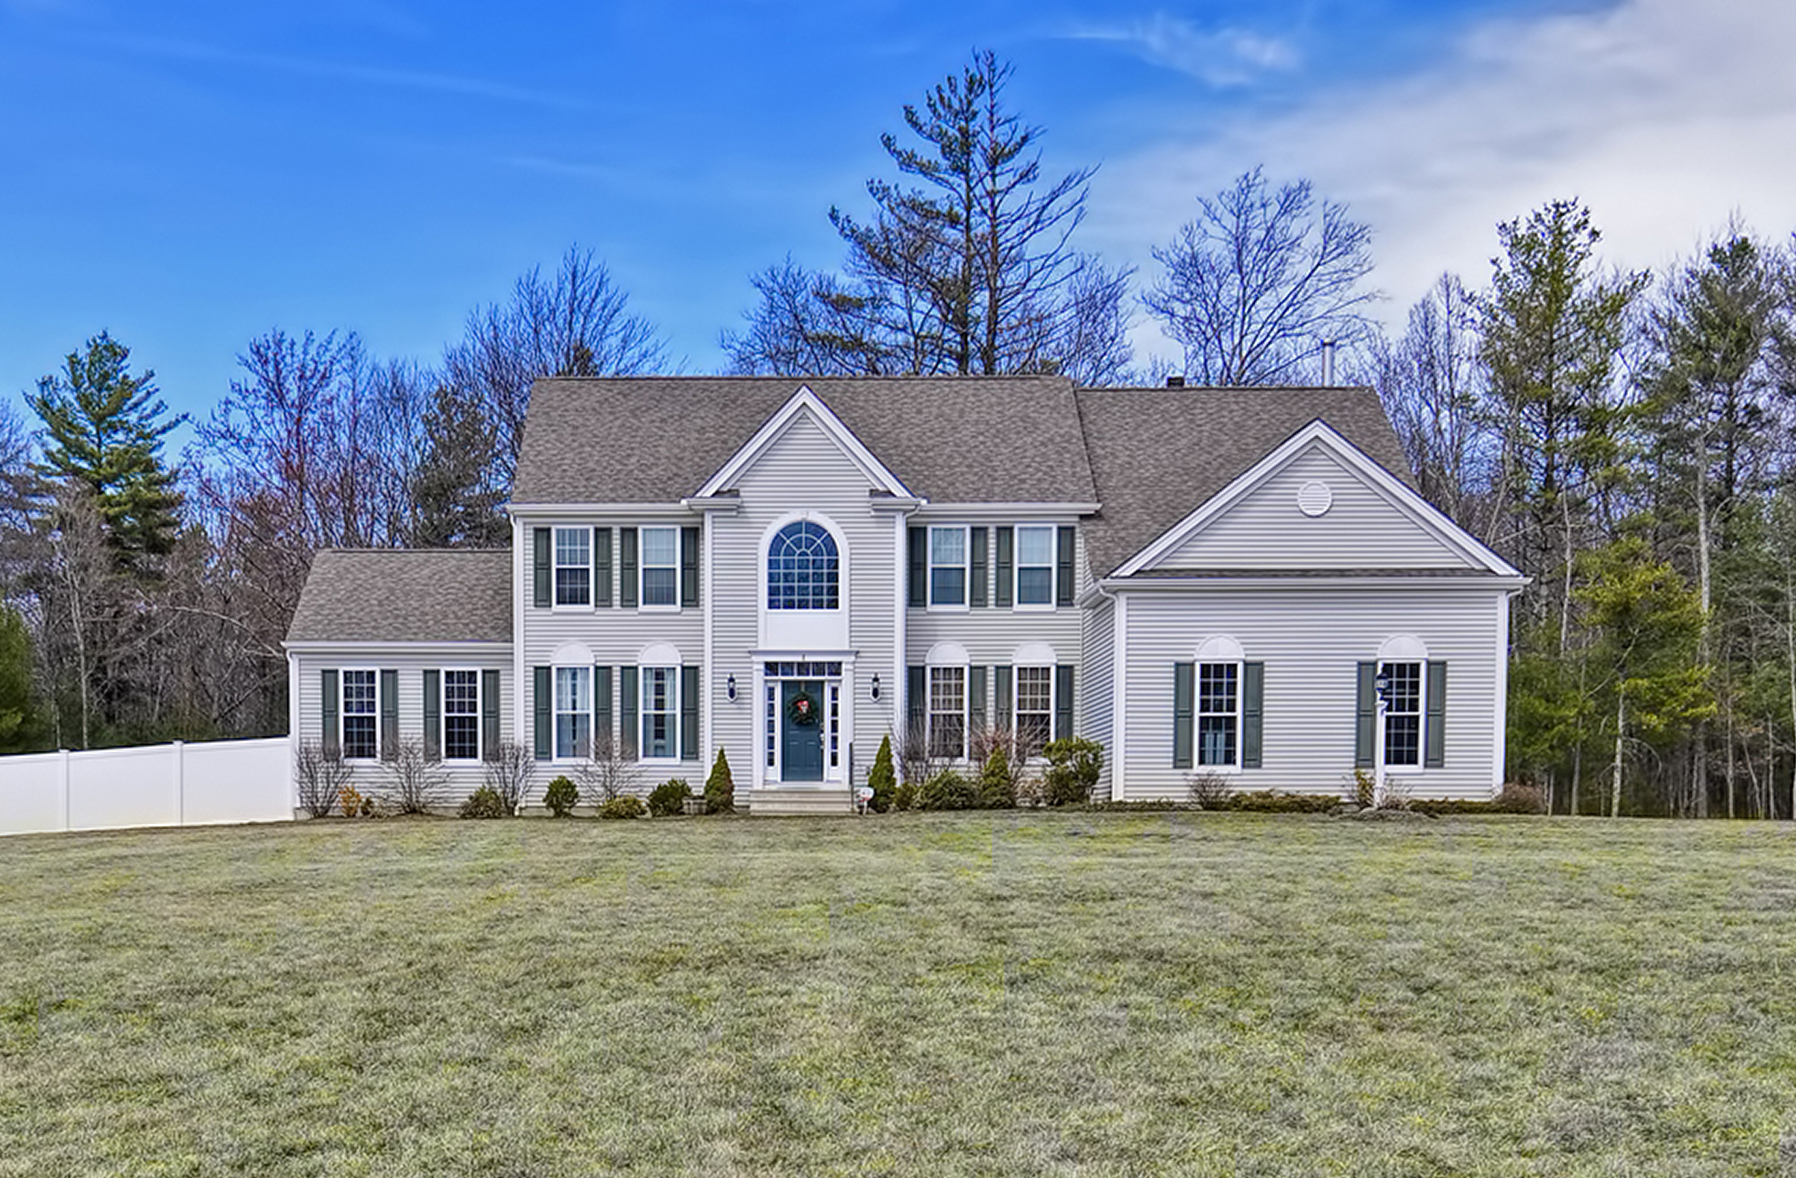 Casa Unifamiliar por un Venta en Expansive Colonial 8 Francis Drive Upton, Massachusetts 01568 Estados Unidos